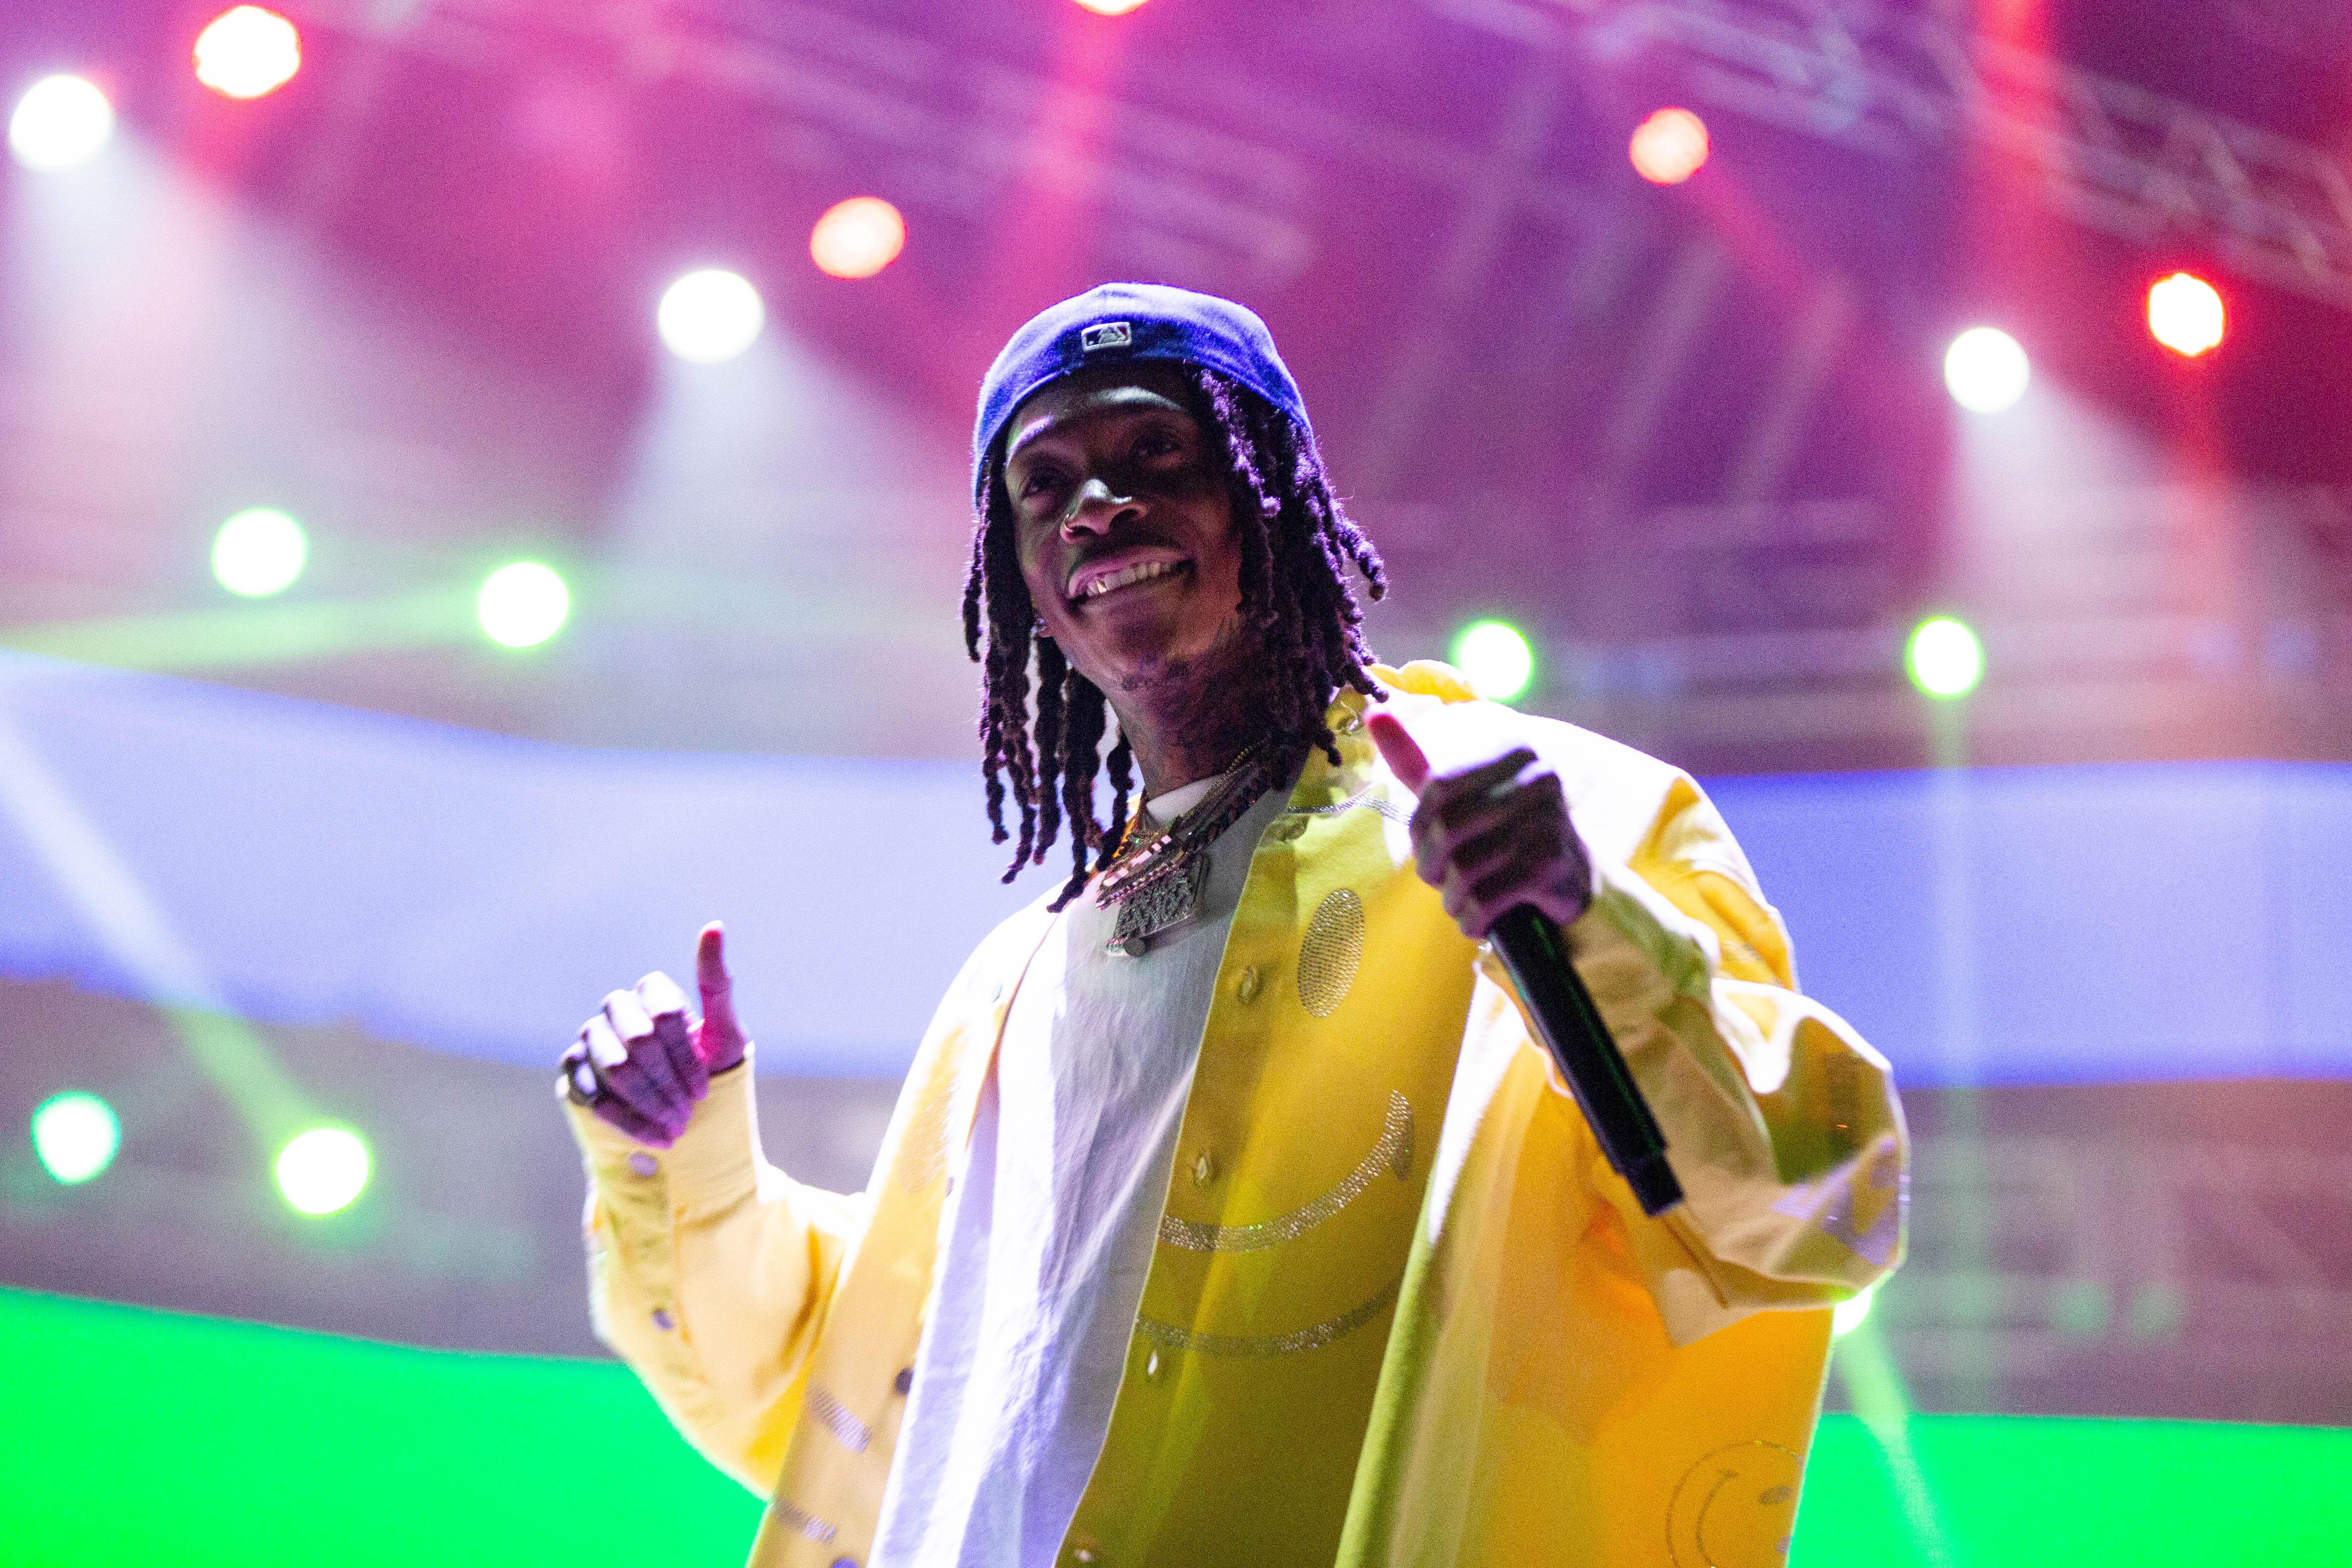 Childish Gambino Wiz Khalifa and More Celebs Who Paid Tribute to Nispey Hustle - Wiz Khalifa